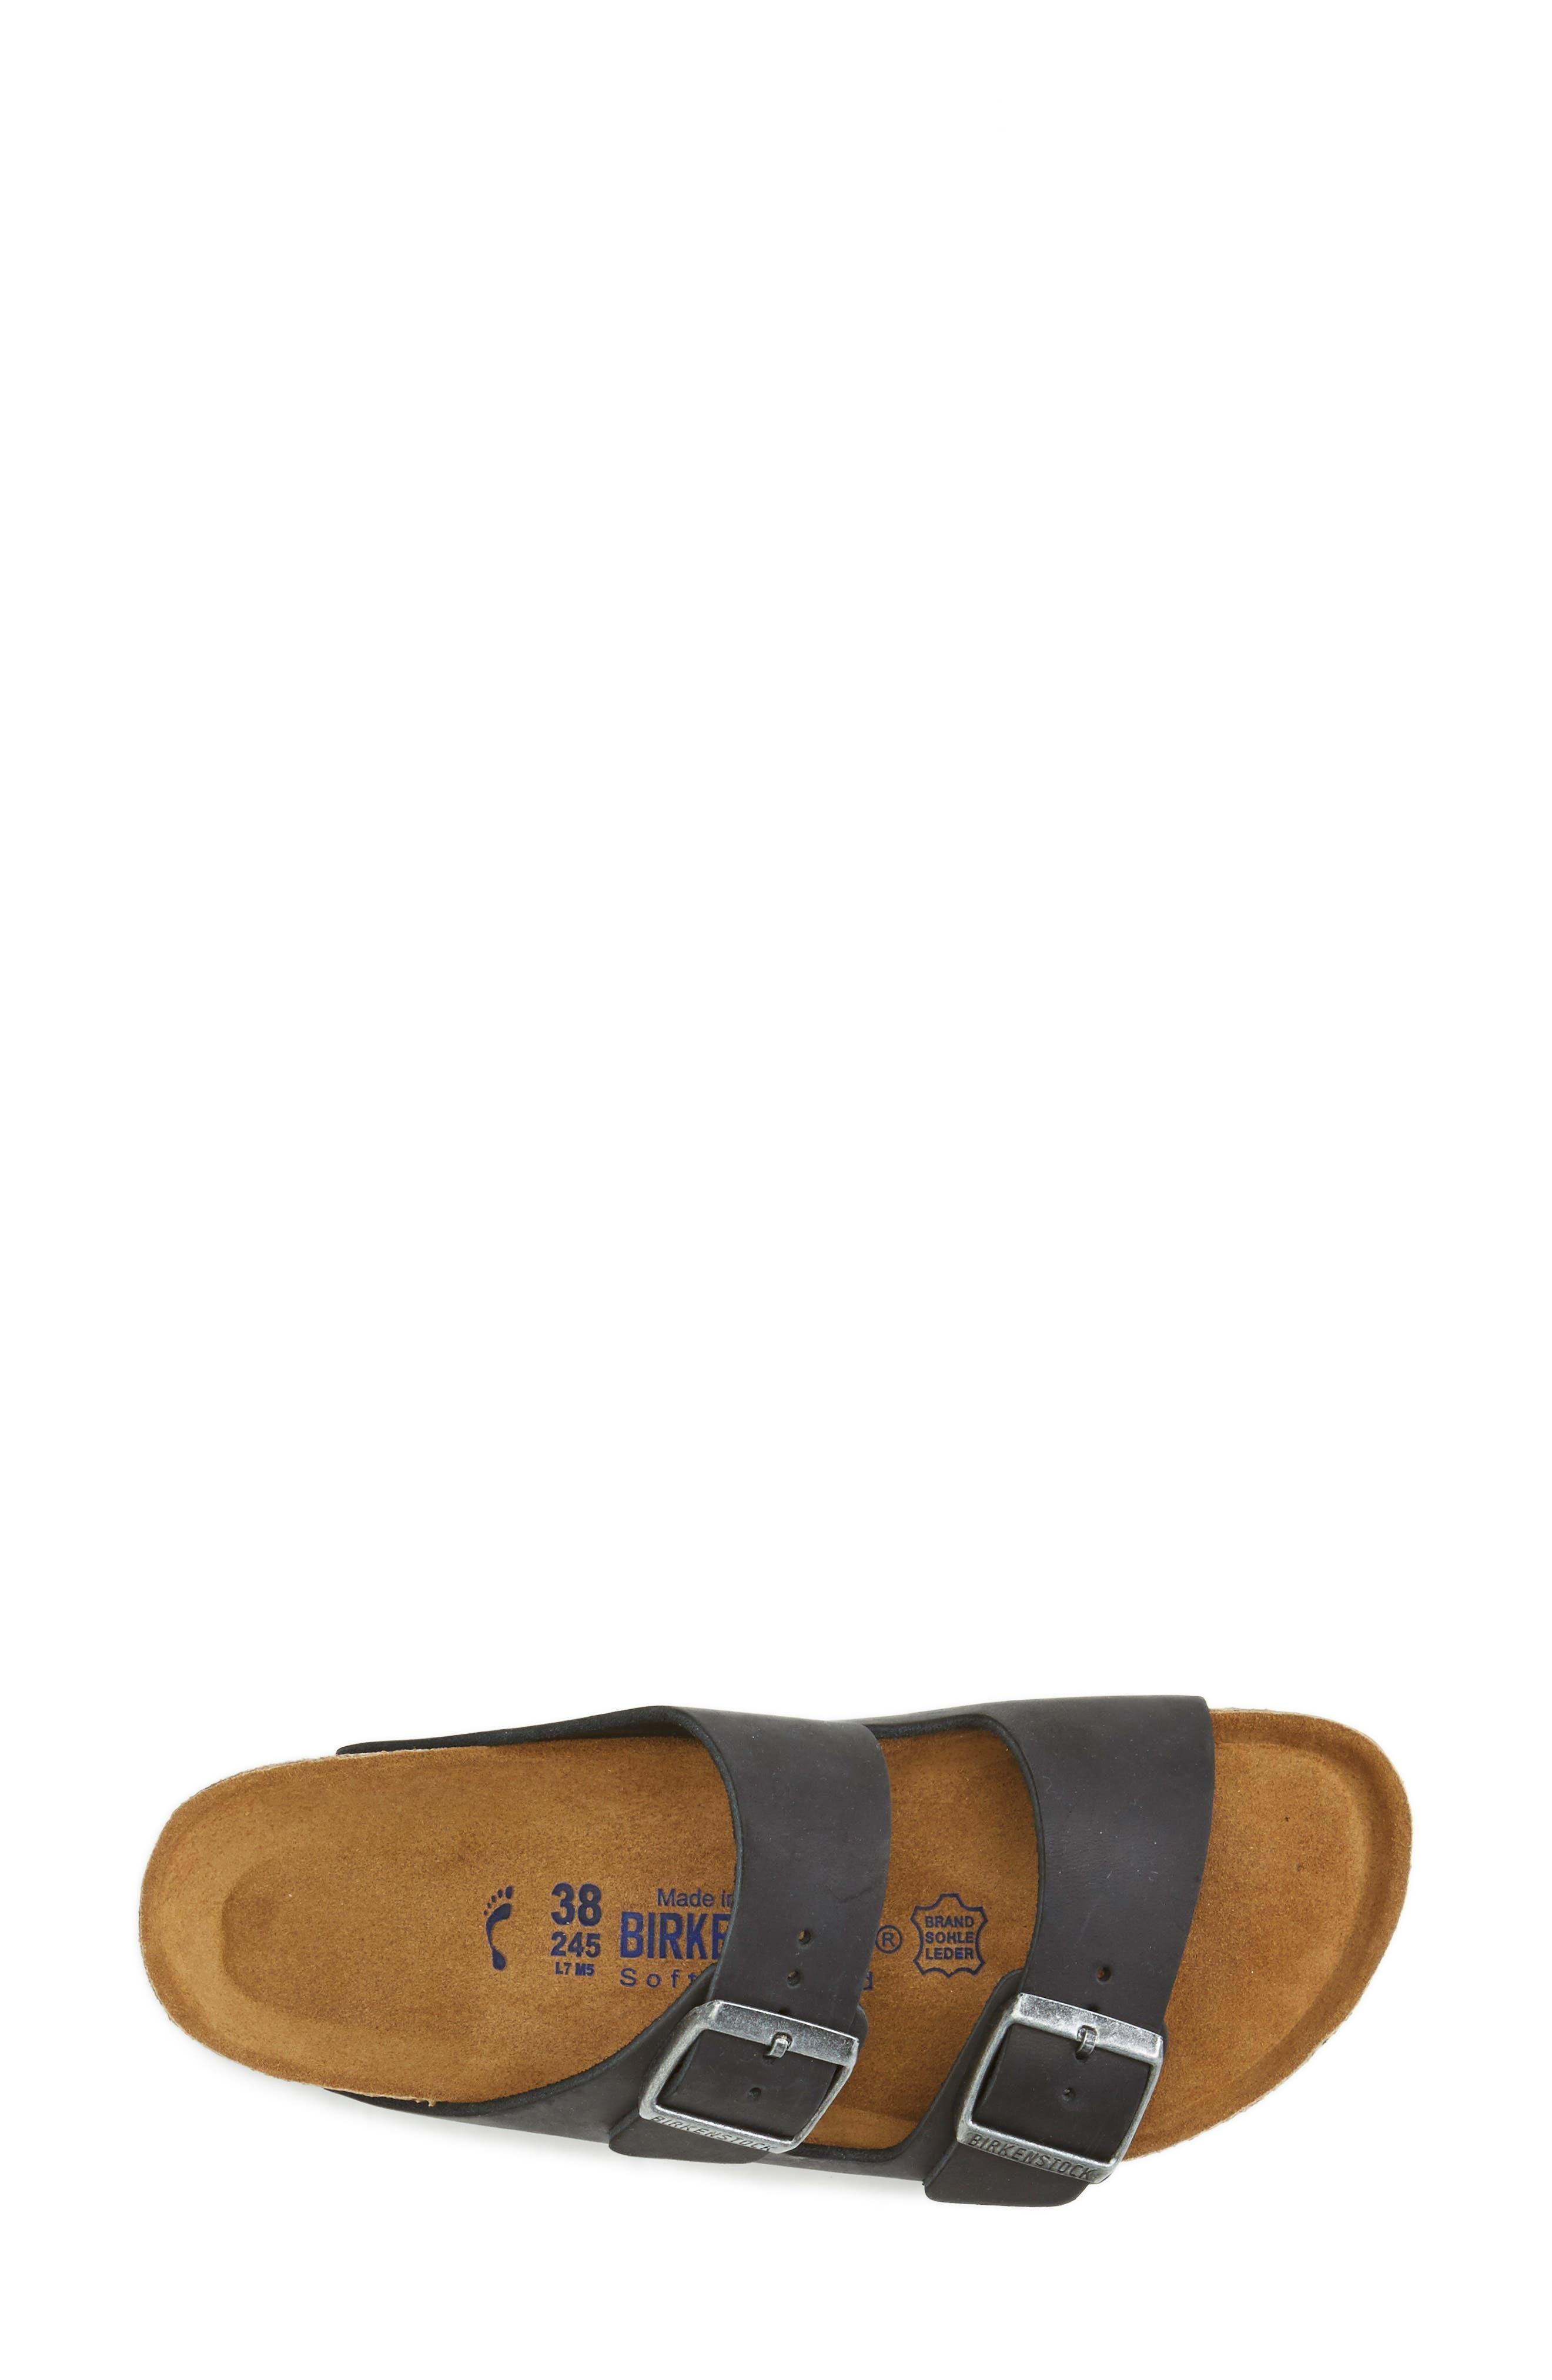 BIRKENSTOCK, Arizona Soft Footbed Sandal, Alternate thumbnail 3, color, BLACK/ BLACK